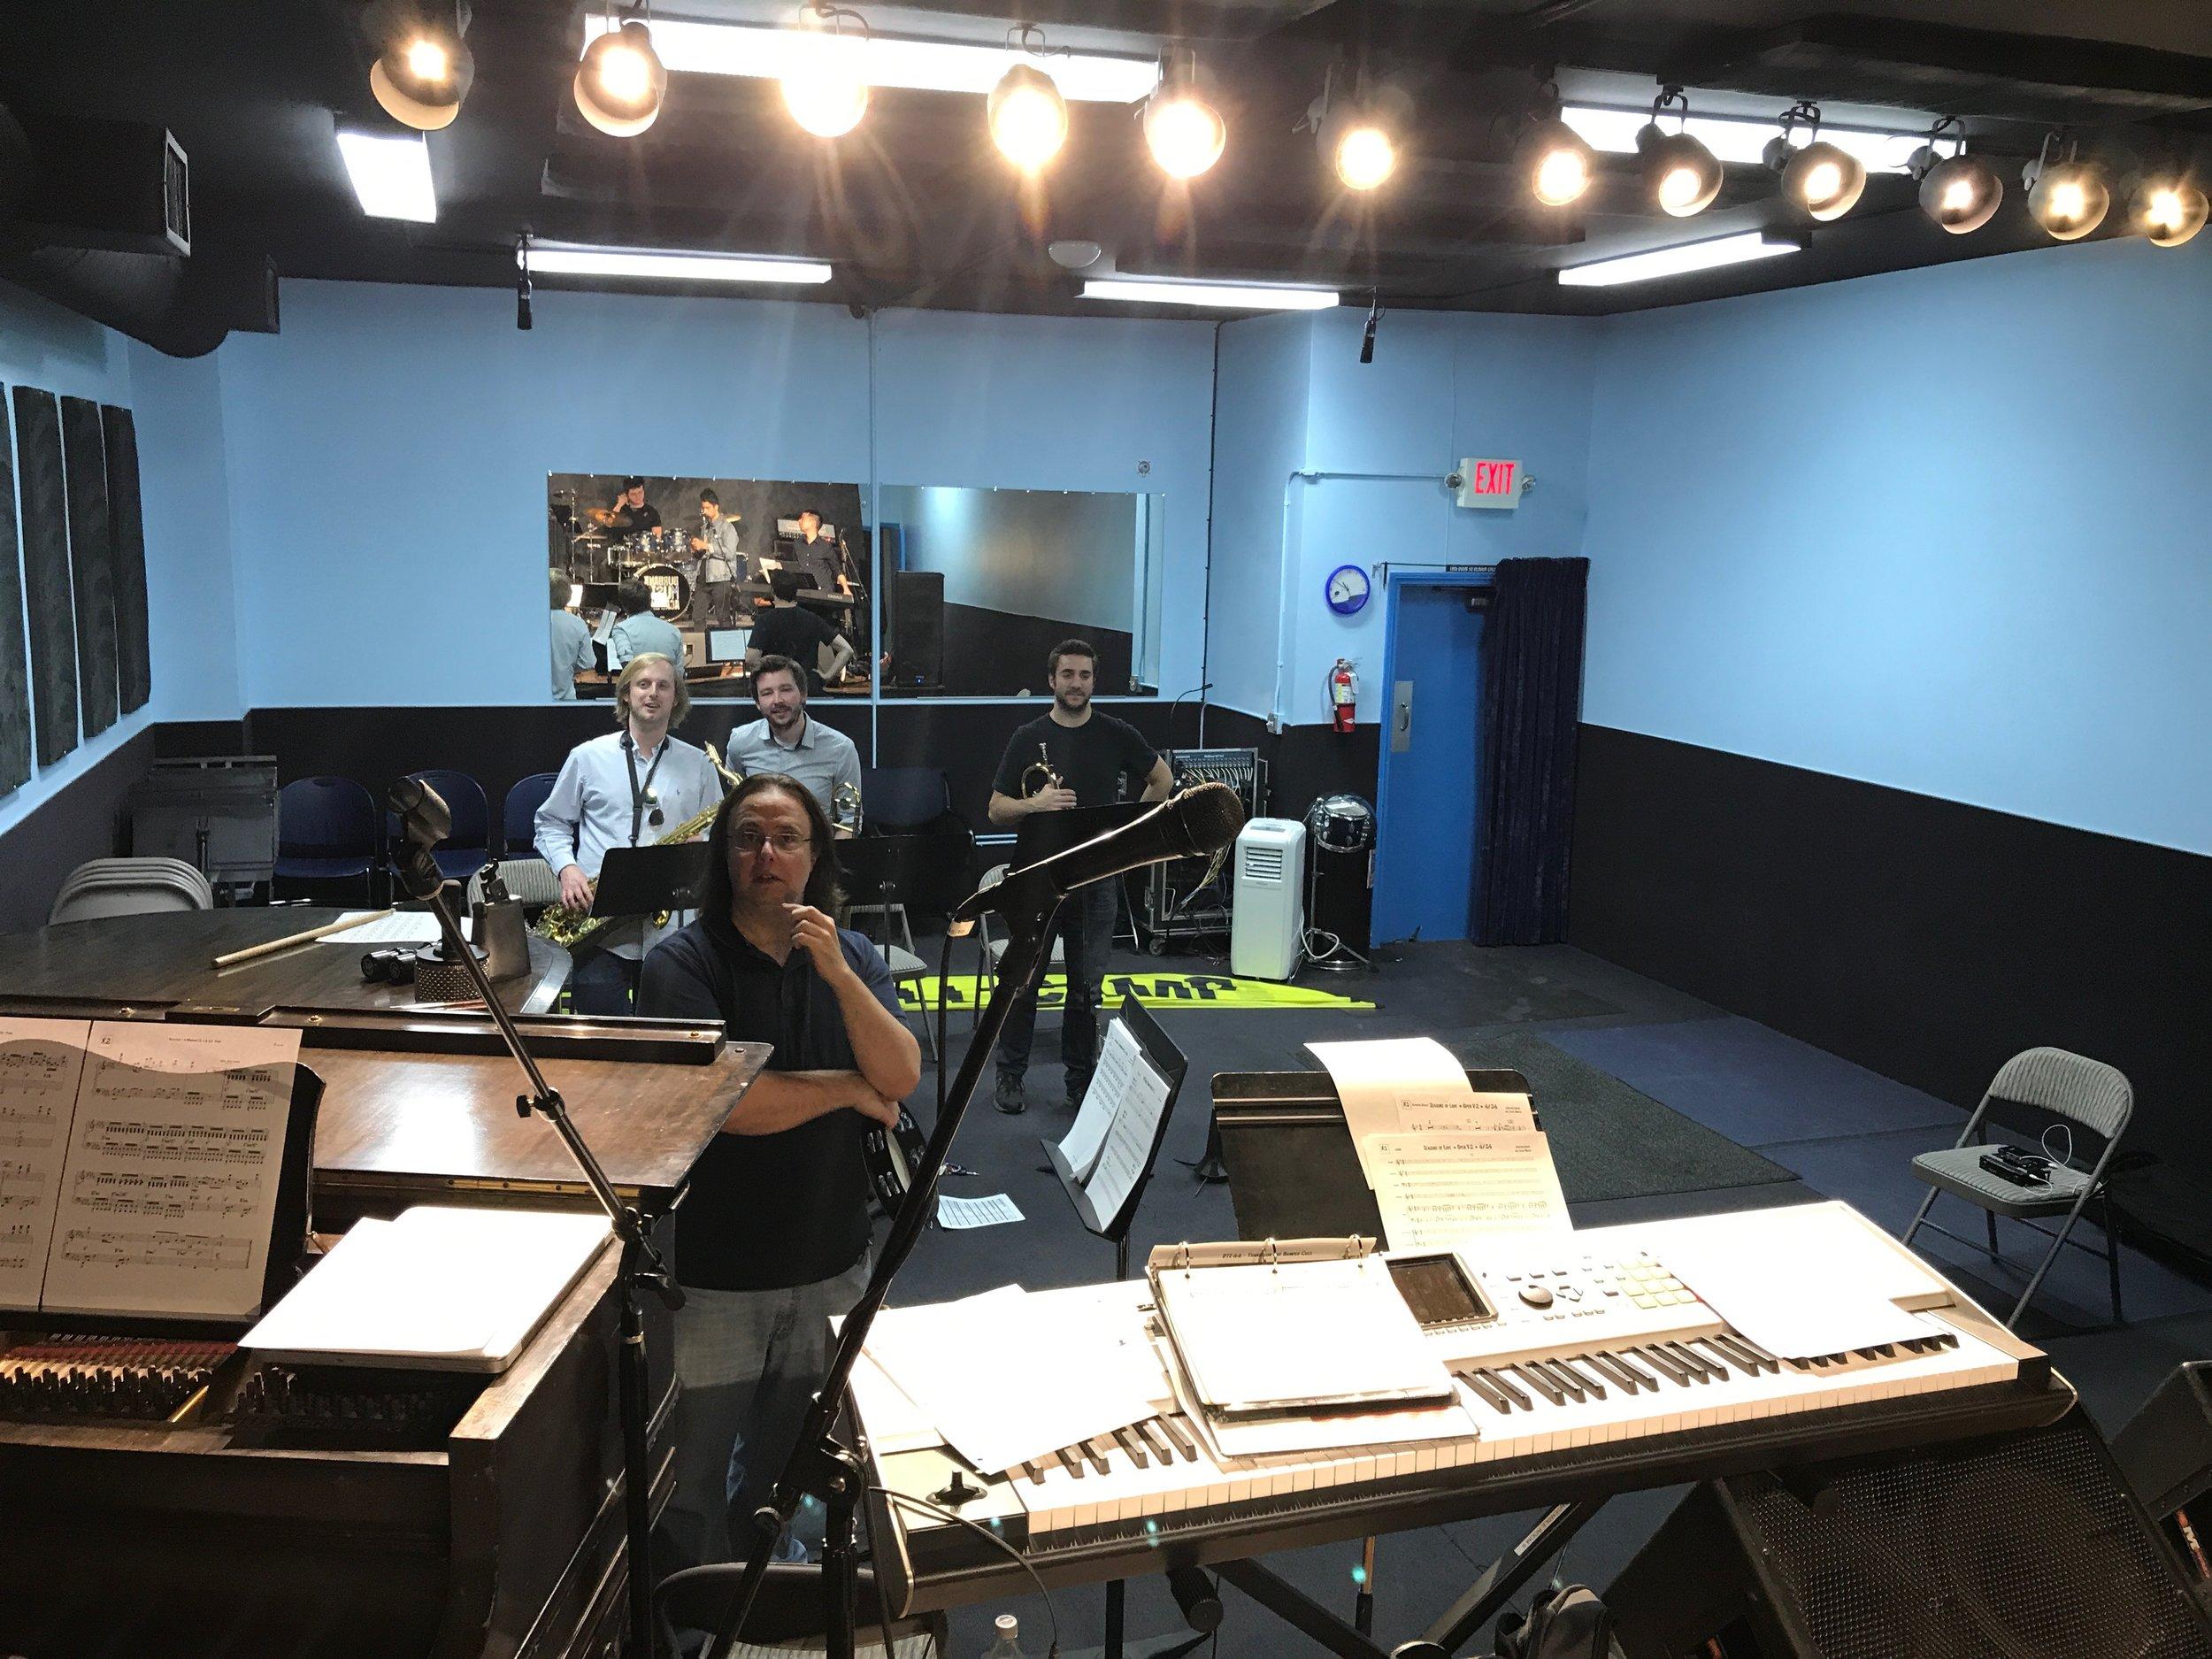 Early rehearsal at BMA